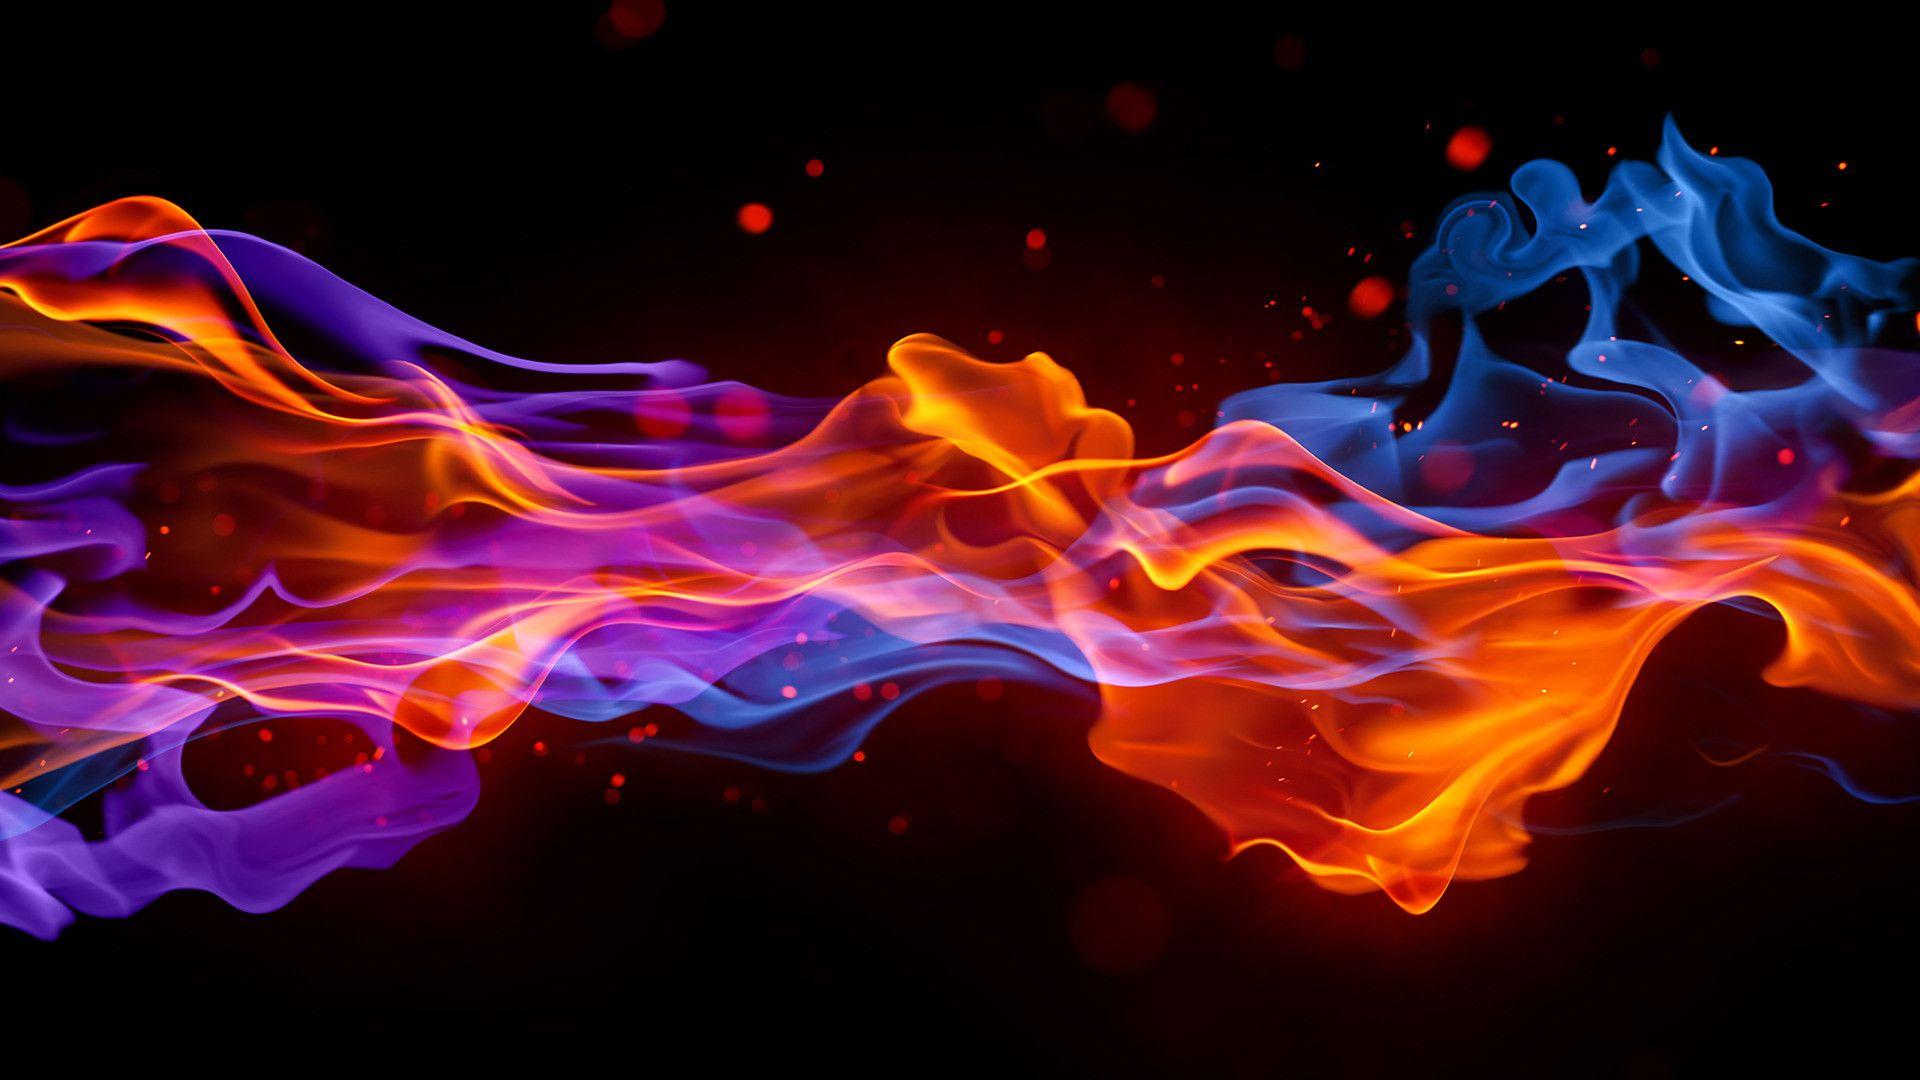 cool fire wallpaper hd